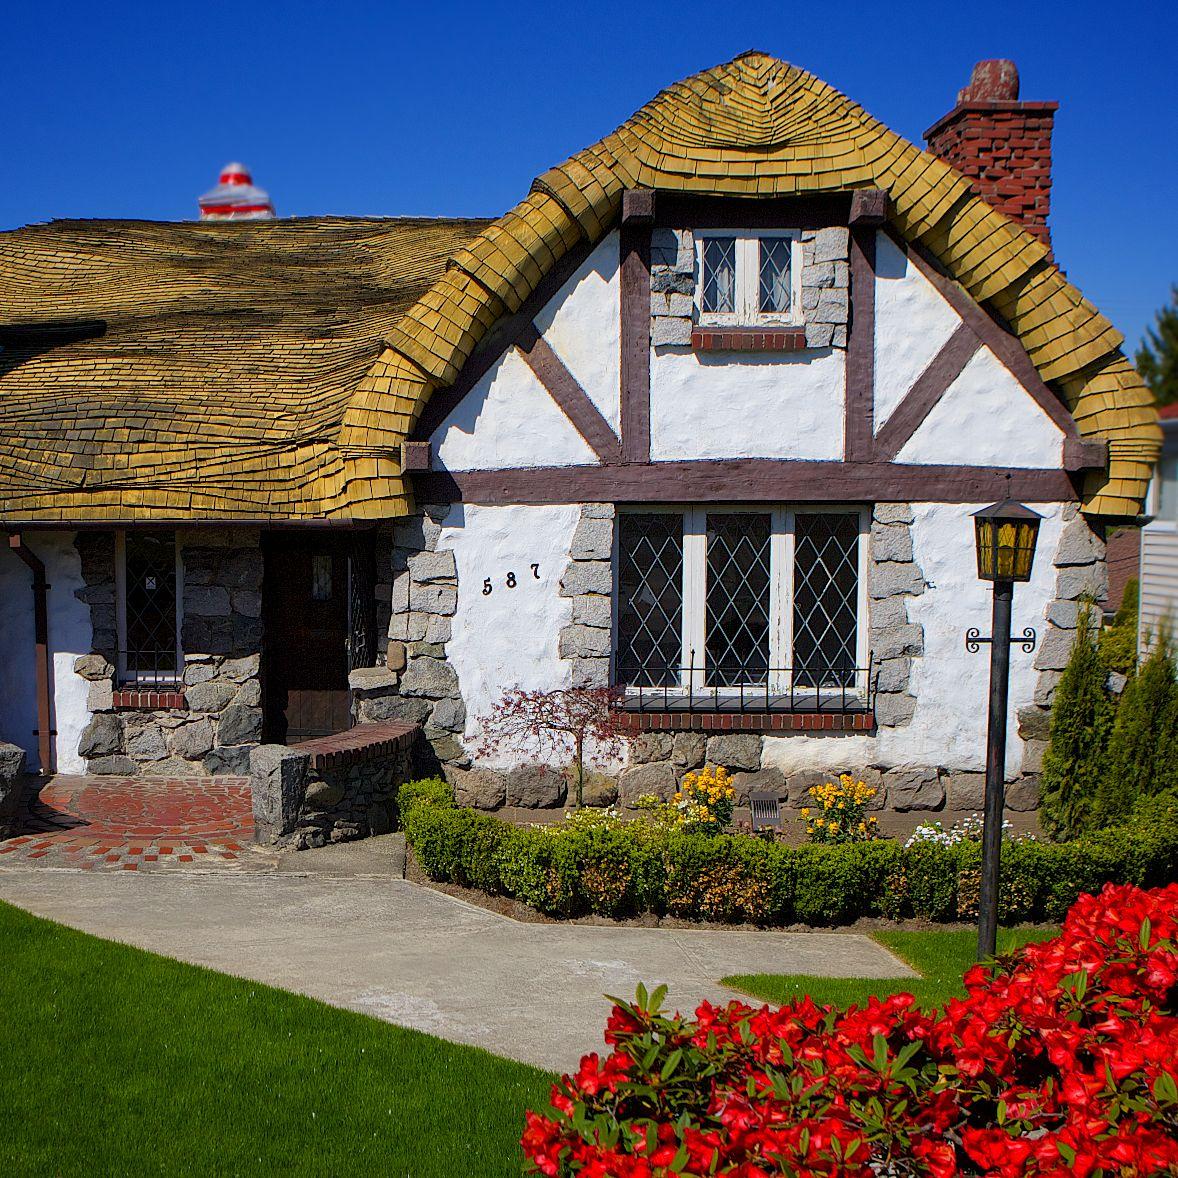 English Cottage Village: English Cottage Stucco Finish - Google Search